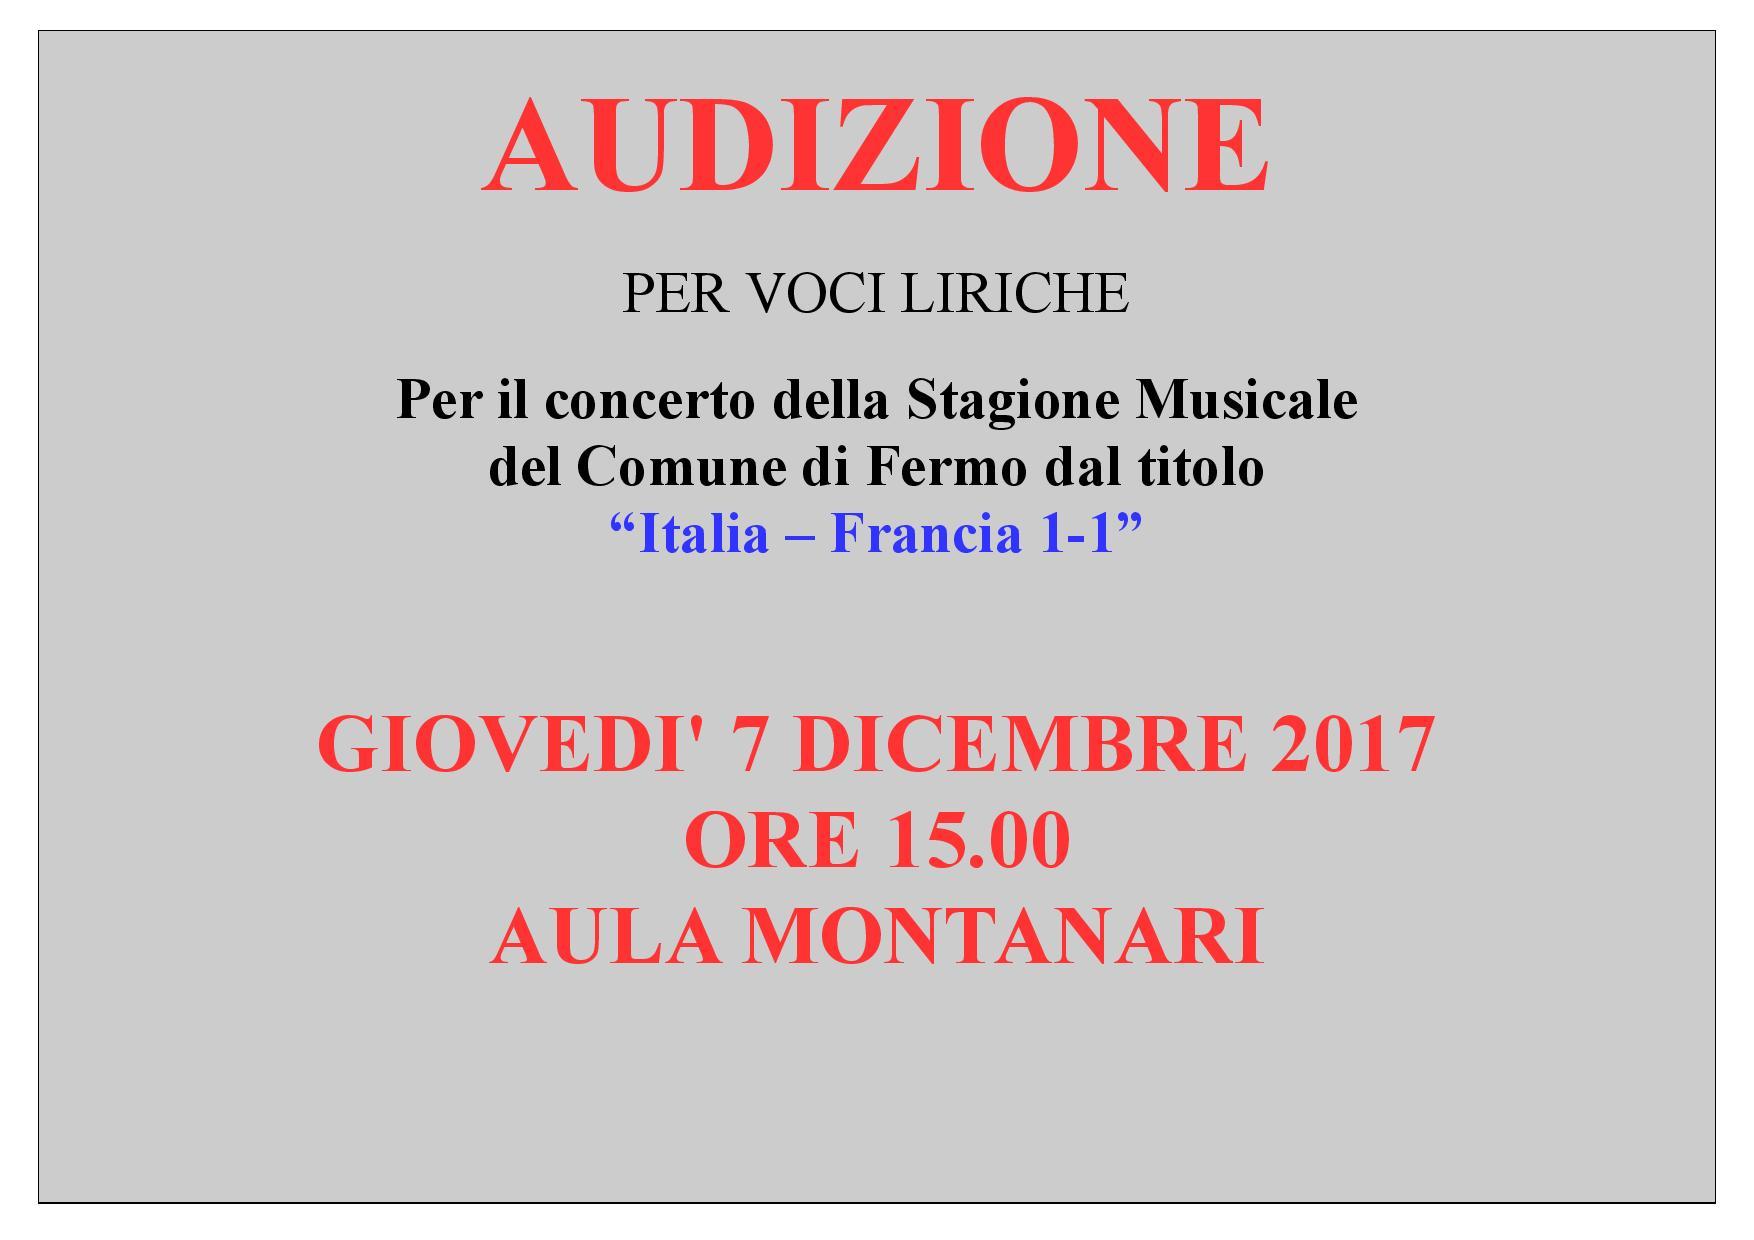 DATA AUDIZIONI ITALIA-FRANCIA